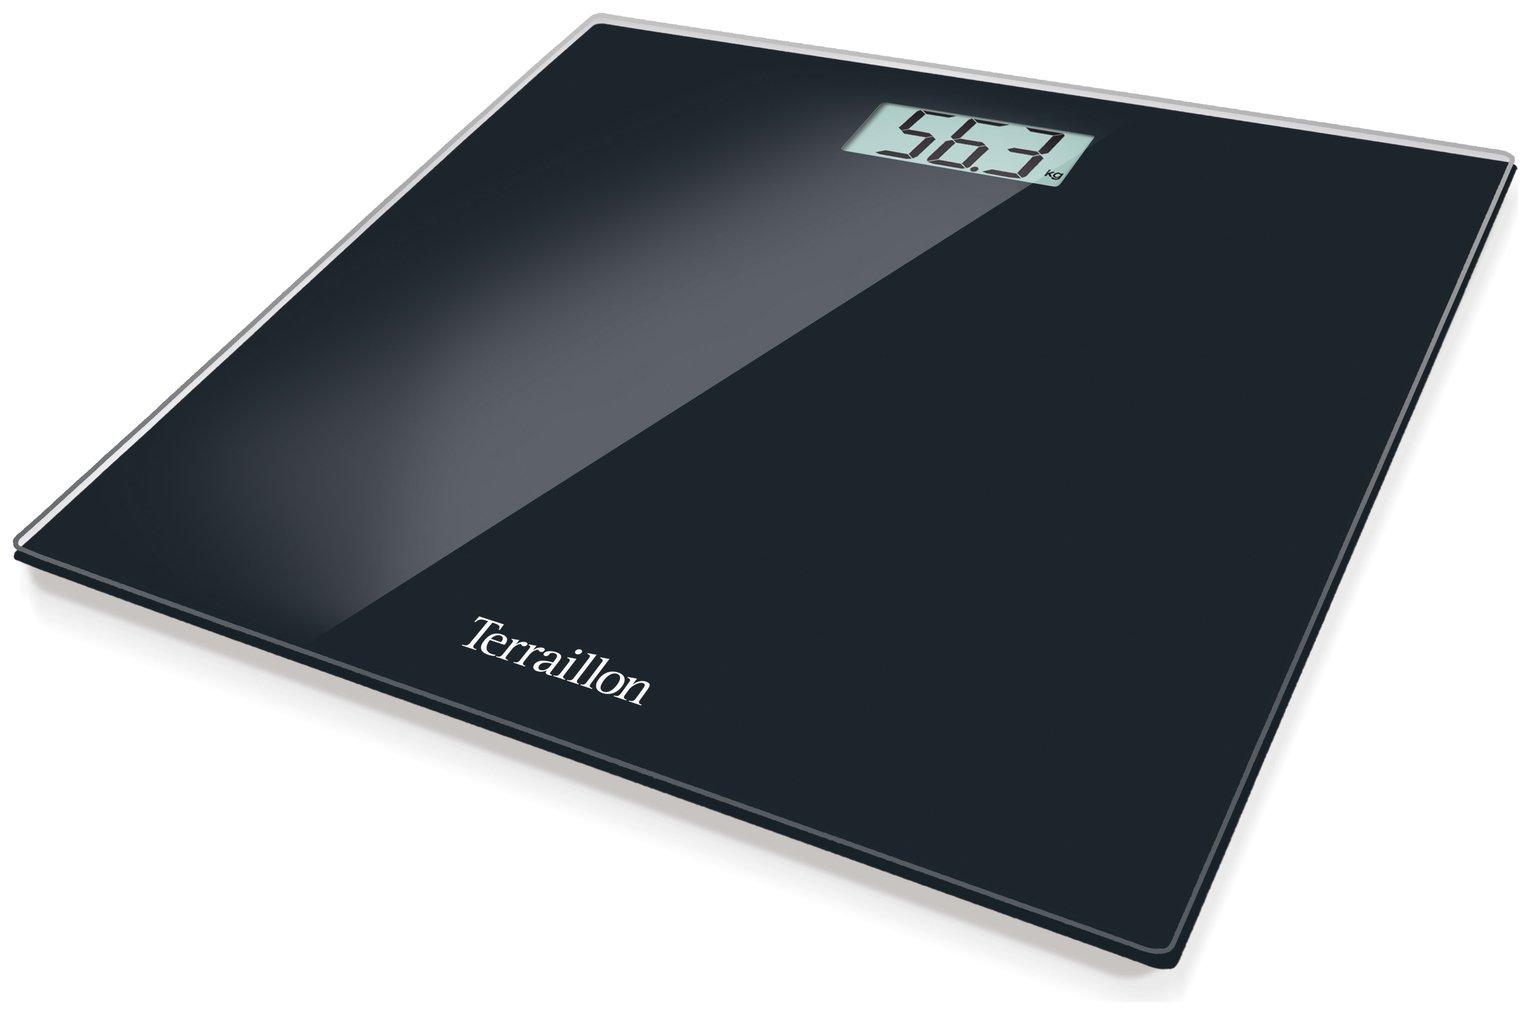 Terraillon TP1000 Electronic Bathroom Scales - Black